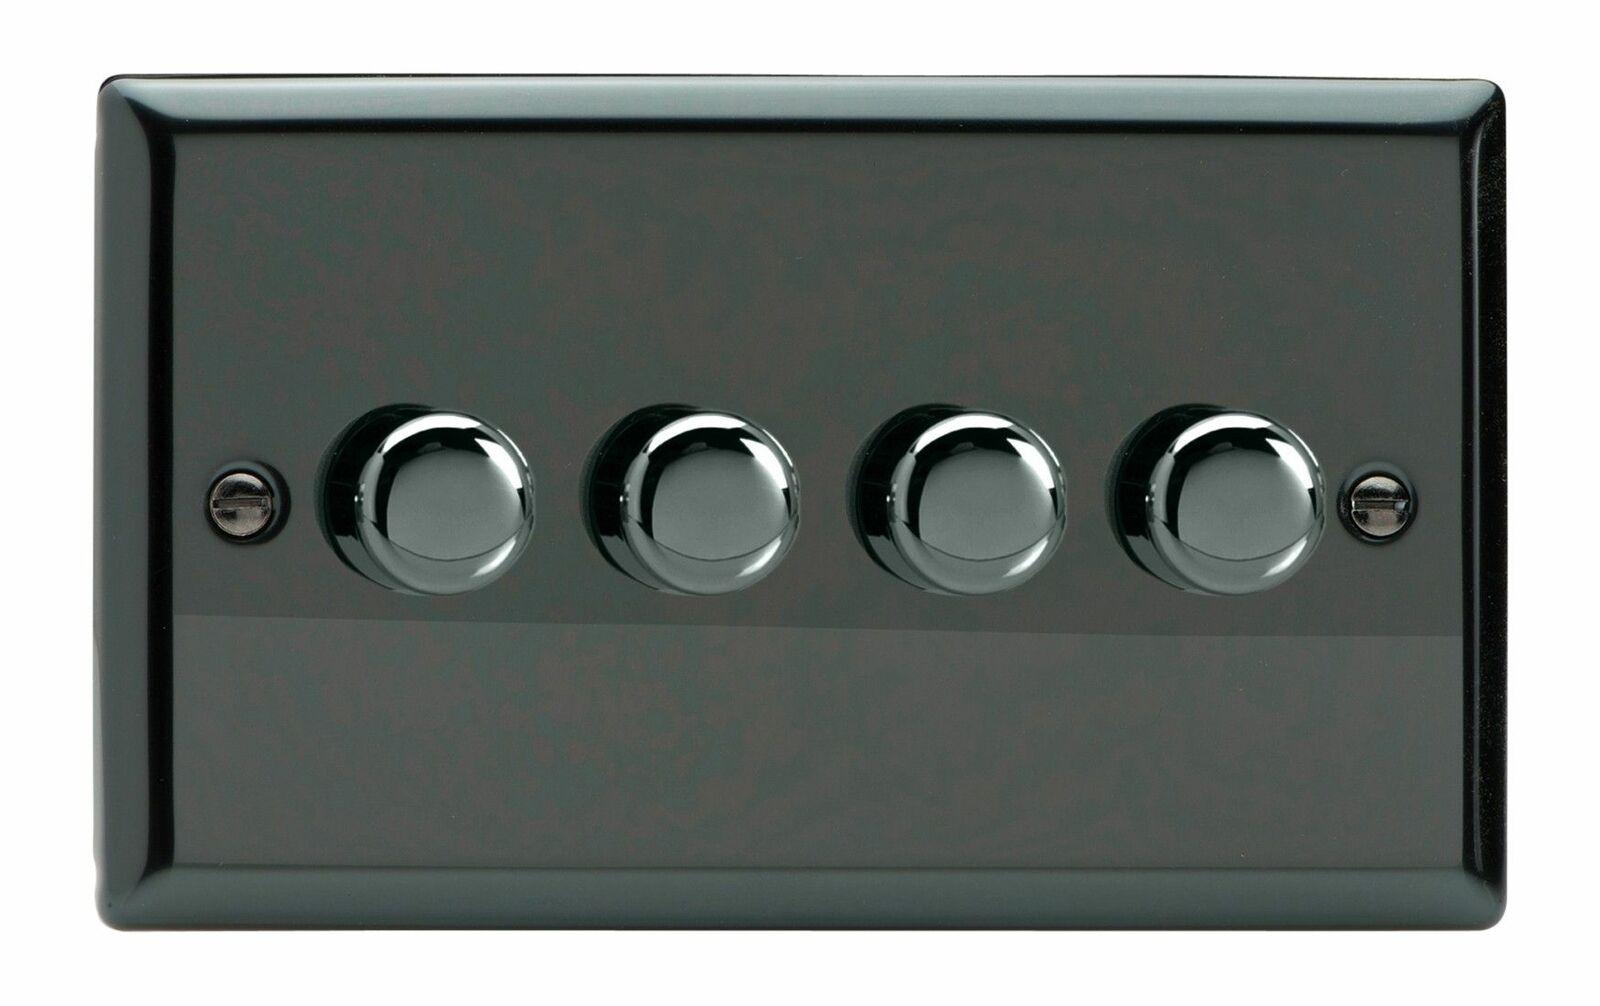 Varilight Iridio jidp 254 Negro 4 Gang 2W Push-ON OFF LED Dimmer 0-120W V-Pro